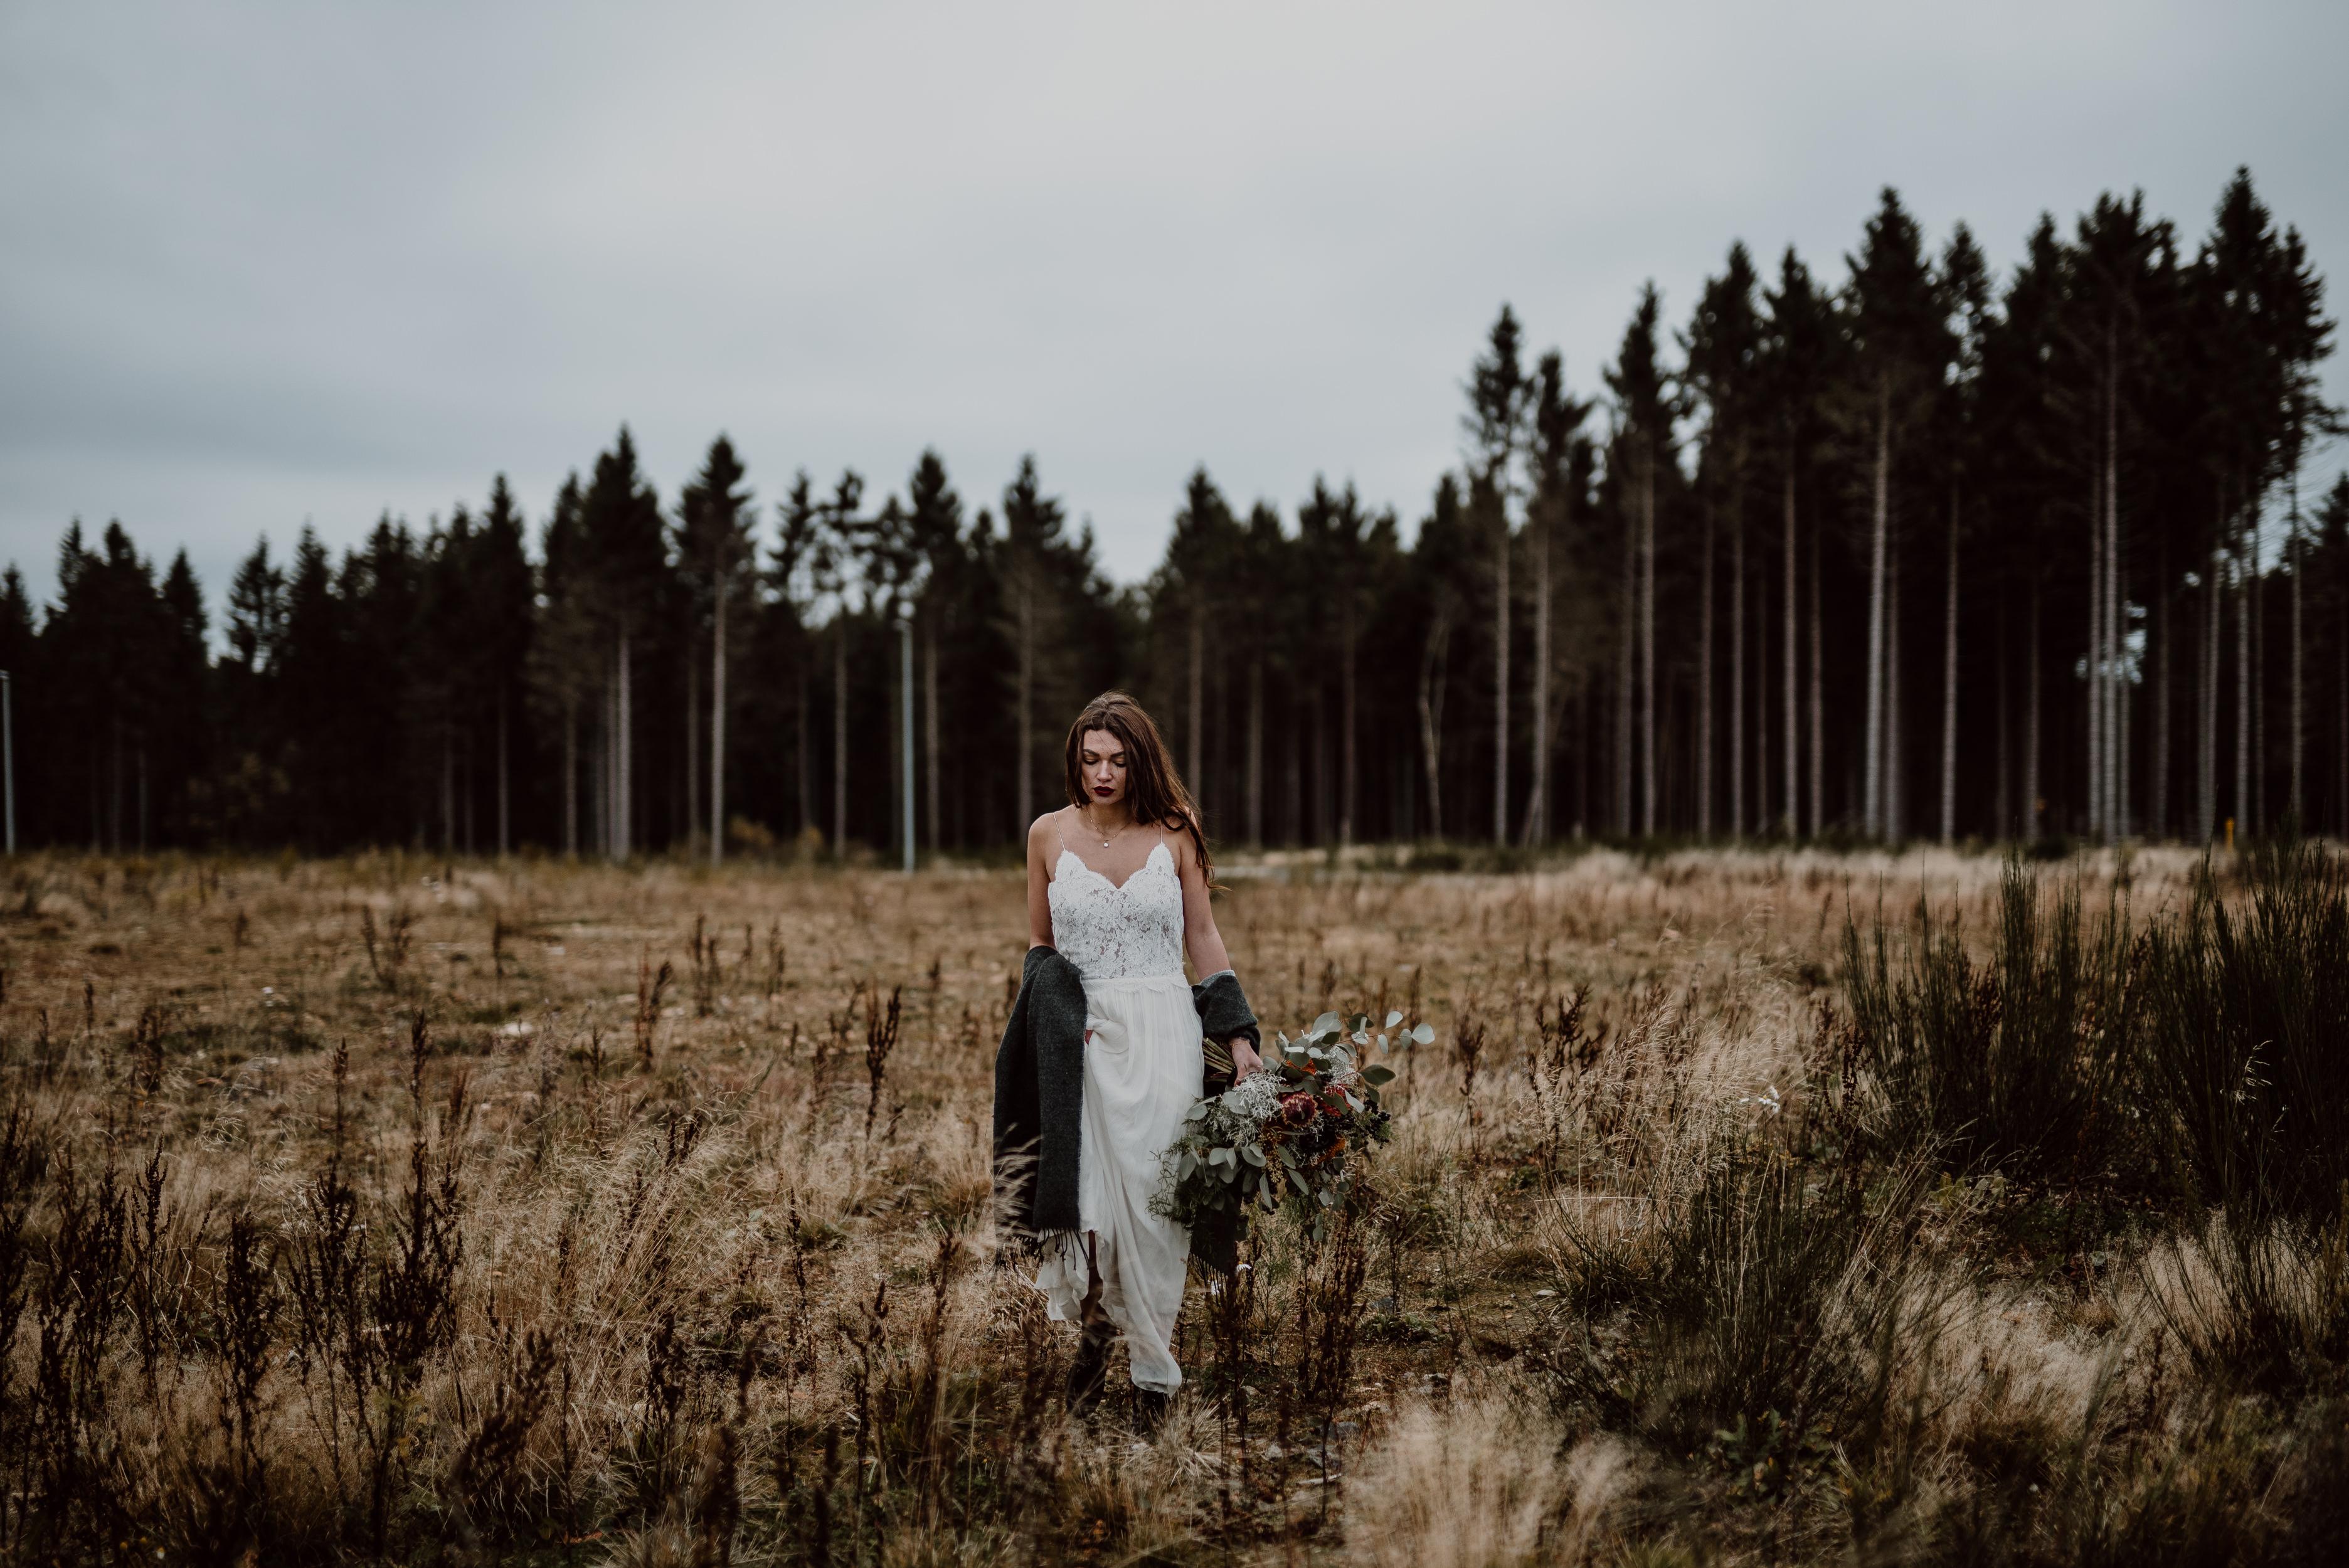 kirasteinfotografie_styled_shoot_winter-127